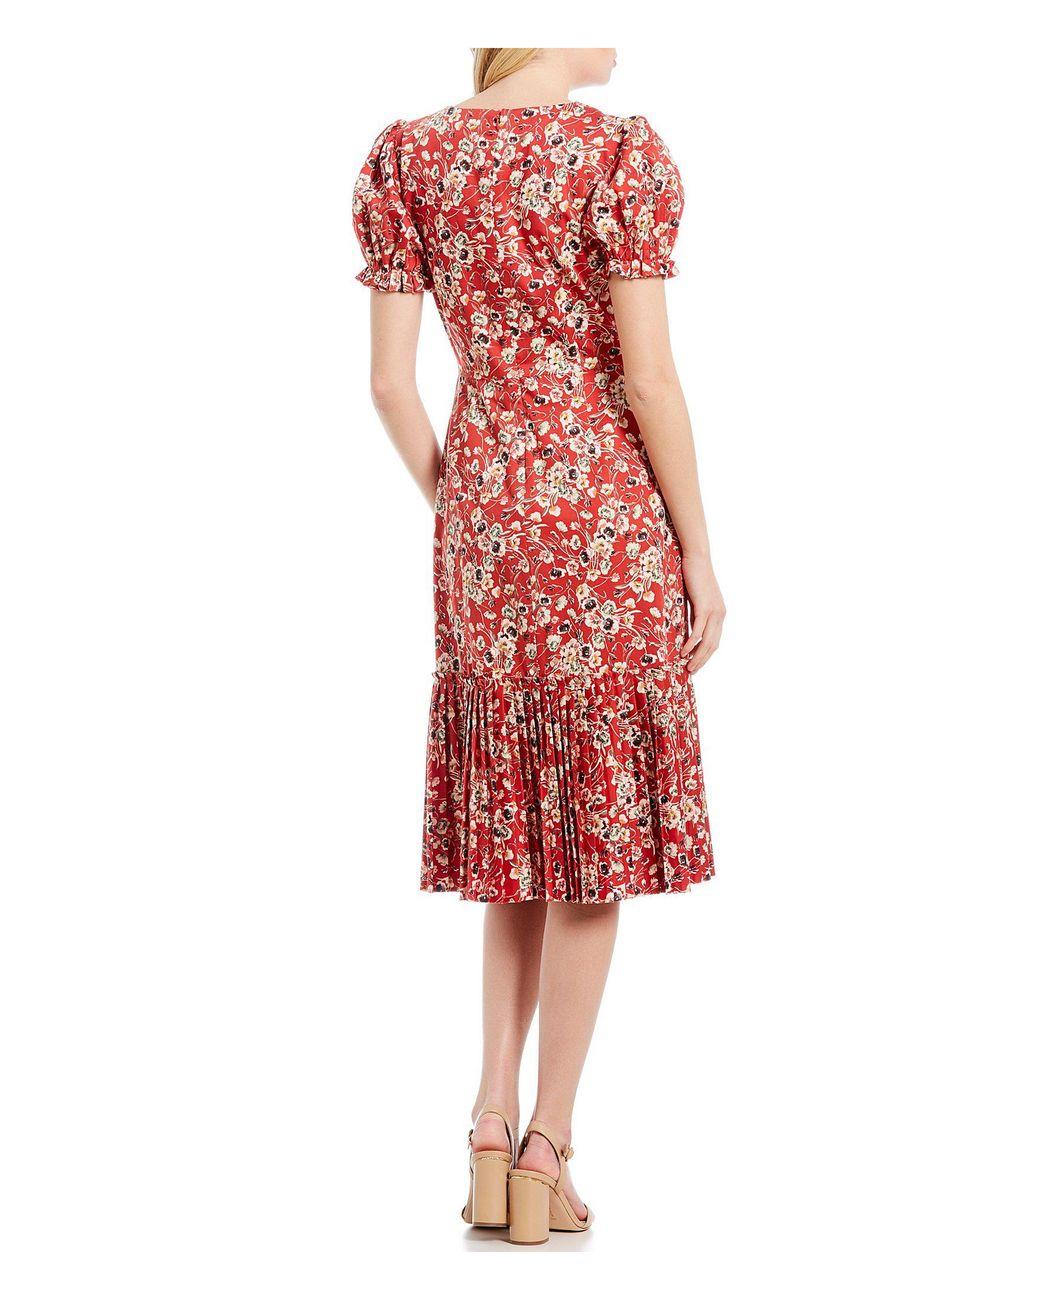 09eb2827972 Antonio Melani Chloe Pleated Floral Print Puff Sleeve Midi Dress in Red -  Lyst